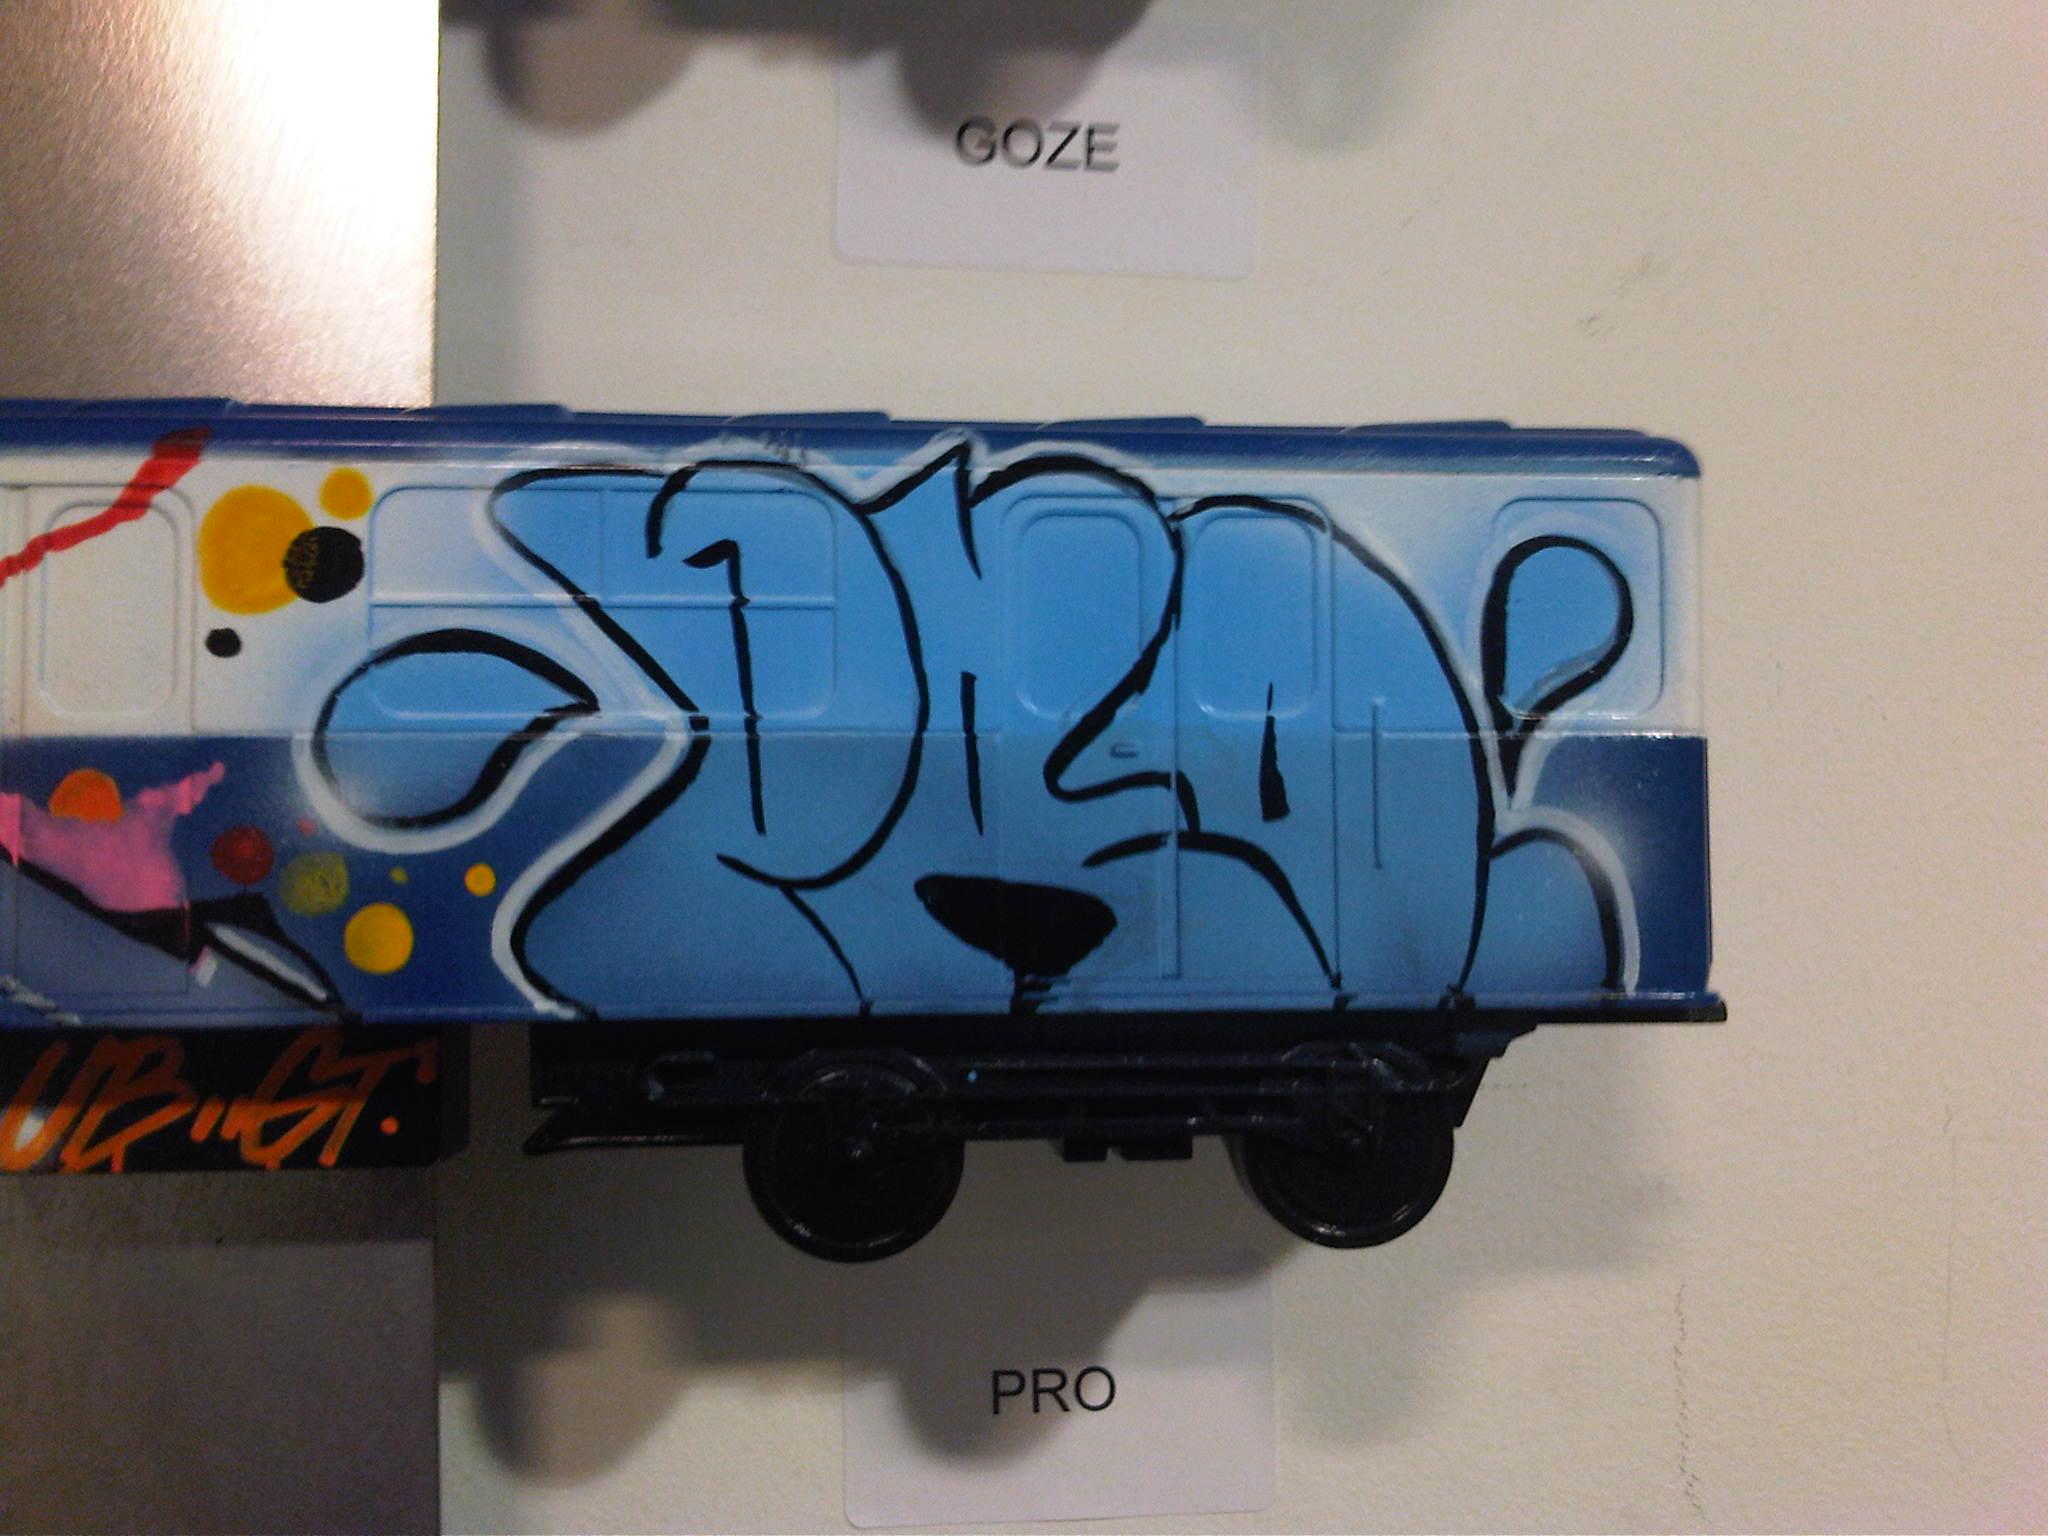 IMG00572-20110108-1605